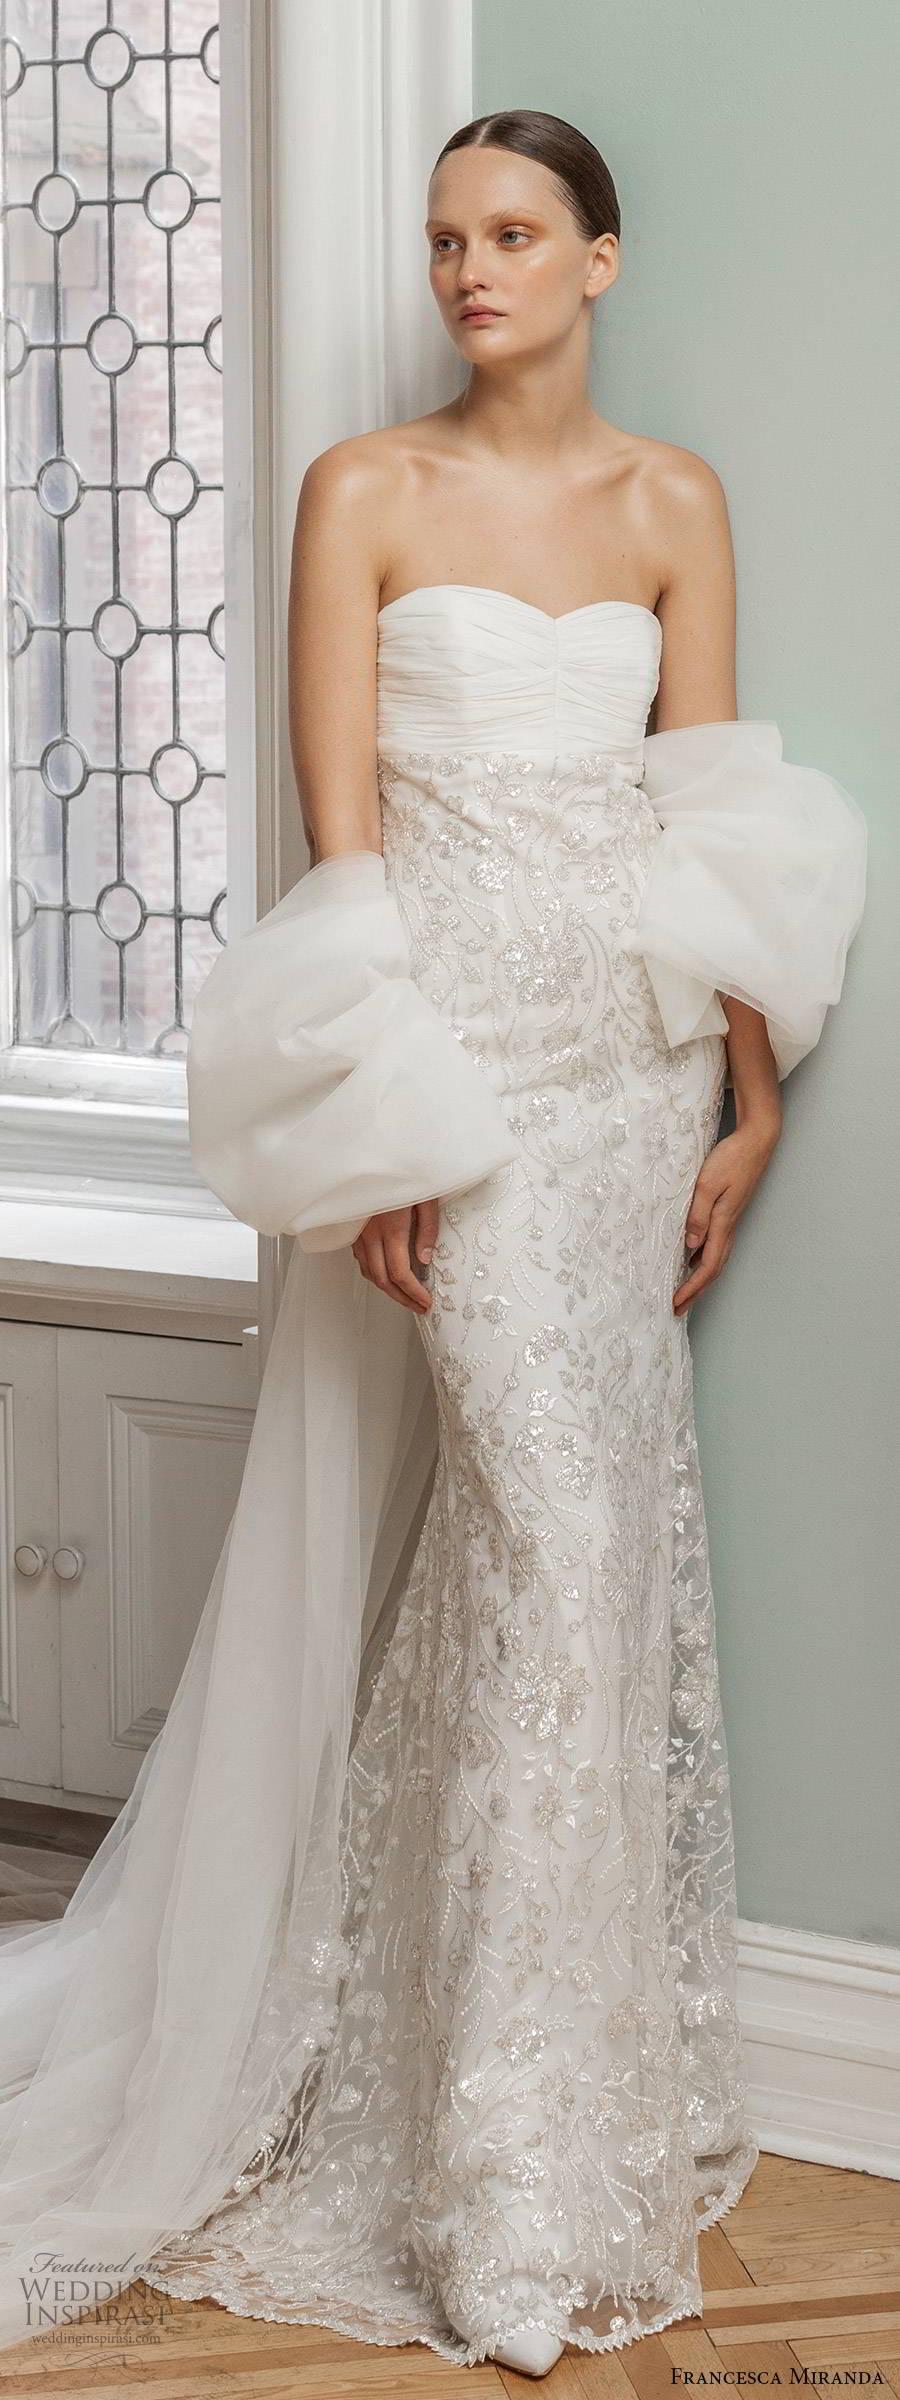 francesca miranda spring 2020 bridal strapless semi sweetheart neckling ruched bodice embellished skirt sheath wedding dress modern glam glitzy chapel train (8) lv